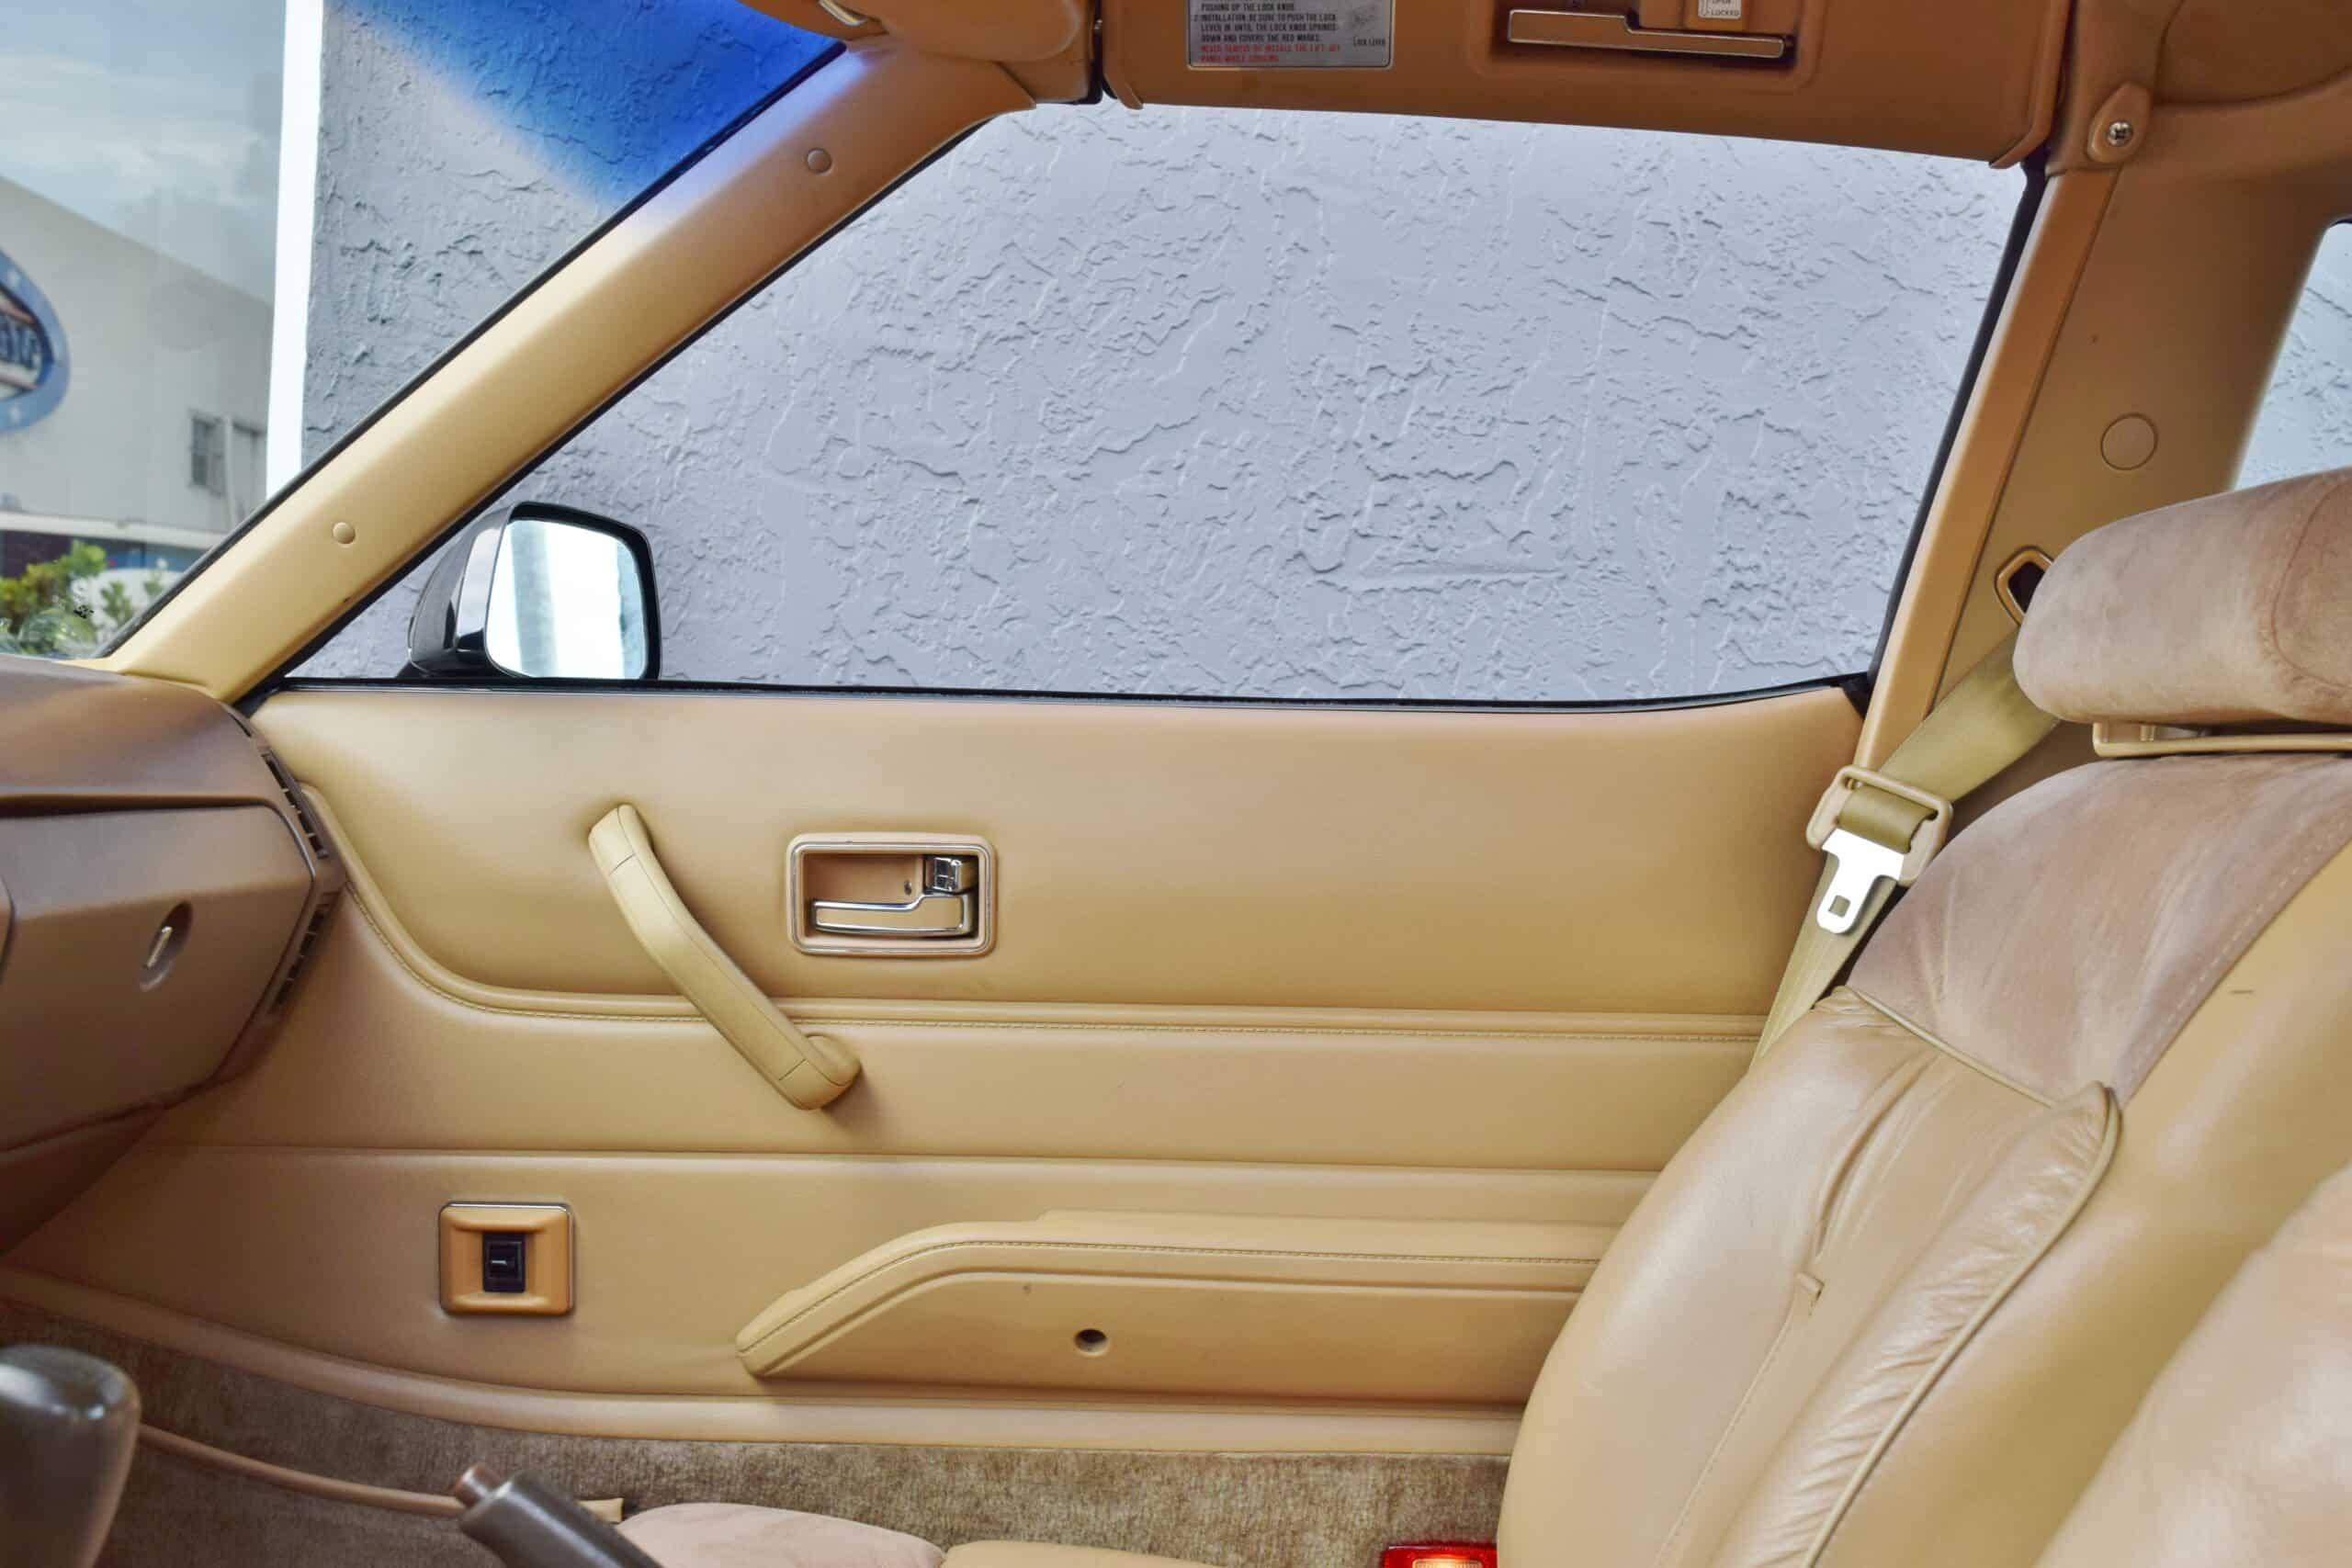 1982 Datsun Z-Series 280ZX 1 Owner-California Car-100% Stock-Original Window Sticker-Full Service History